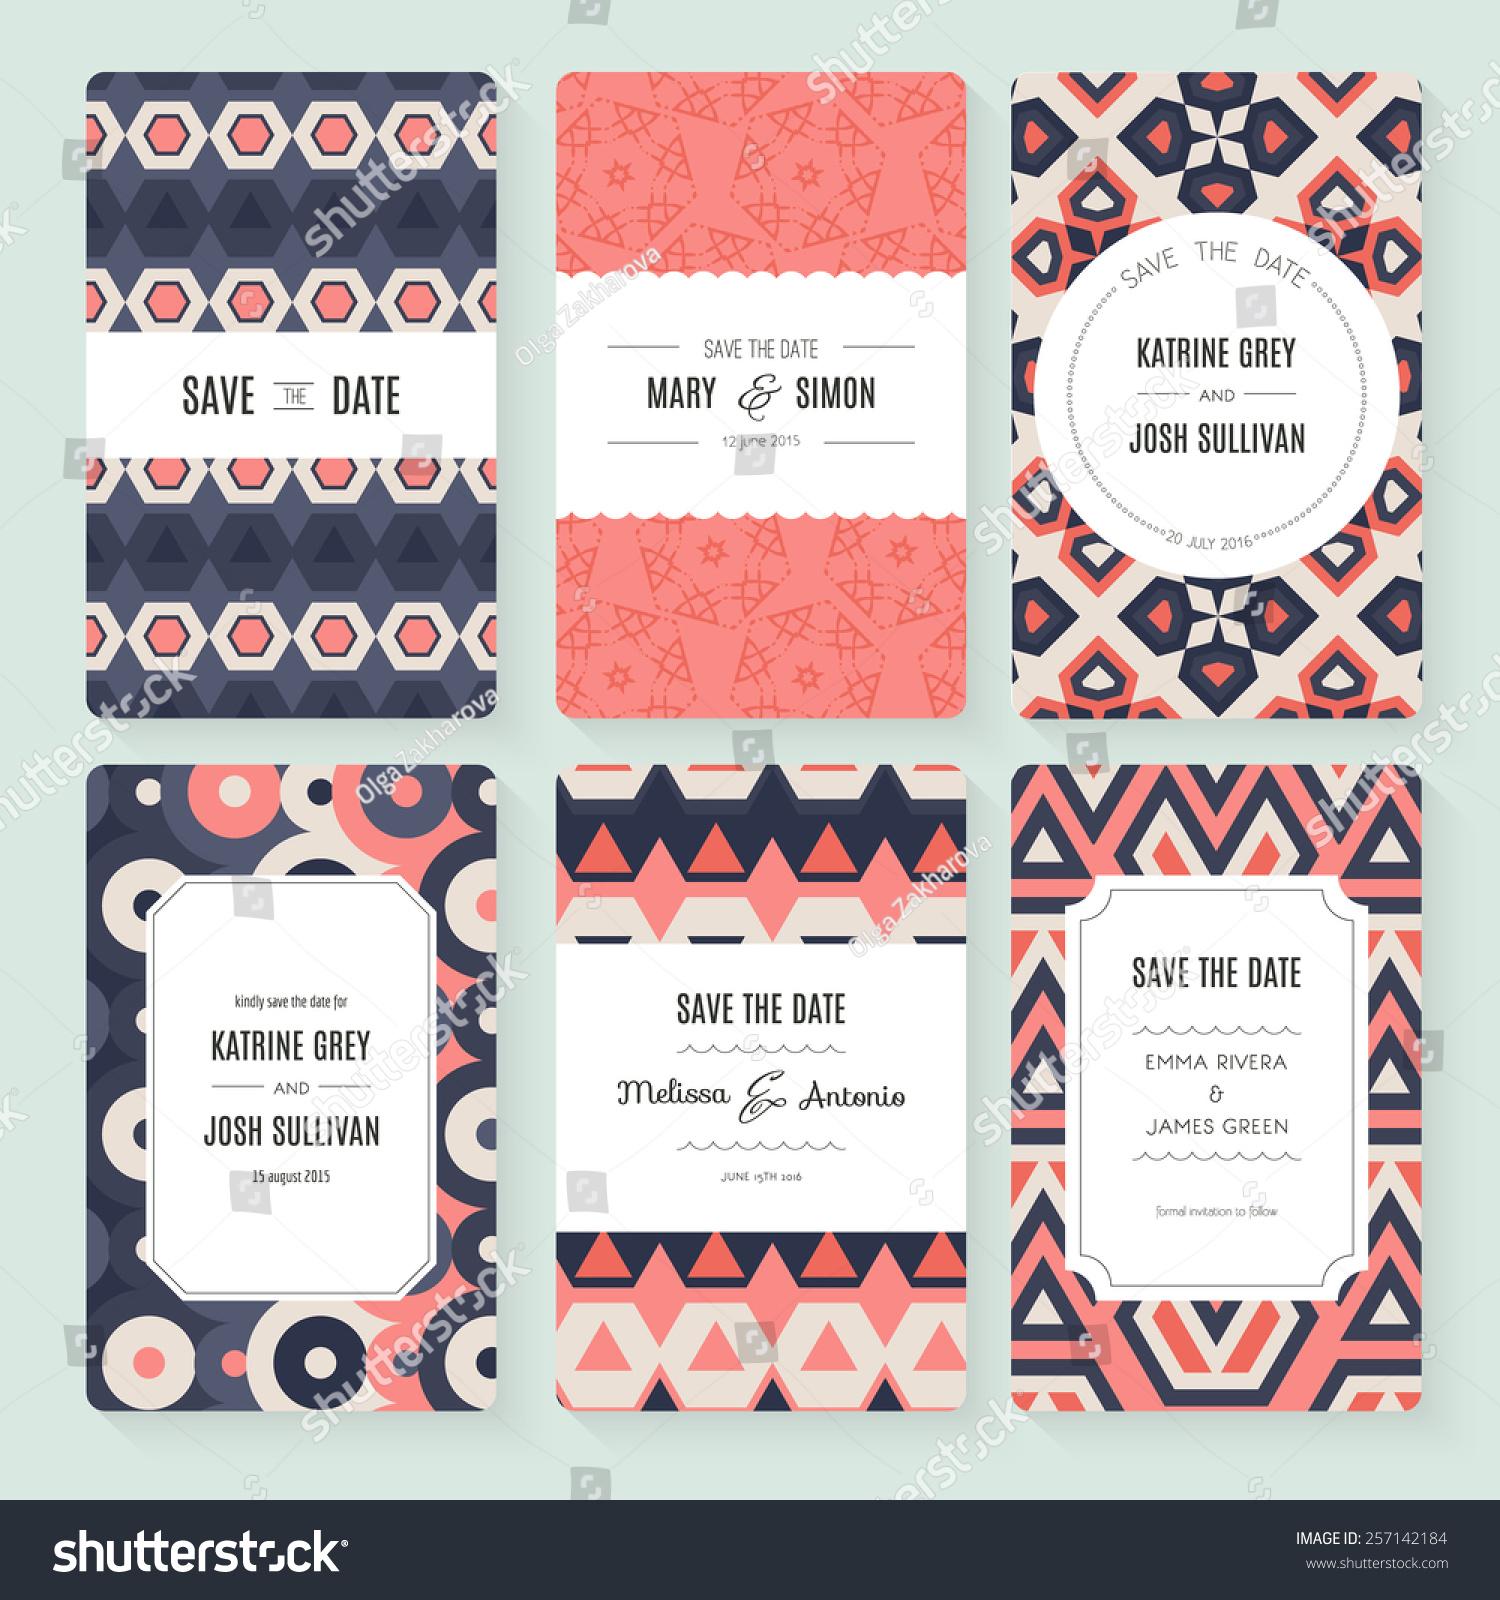 Stylish Save Date Wedding Invitation Card Stock Vector 257142184 ...